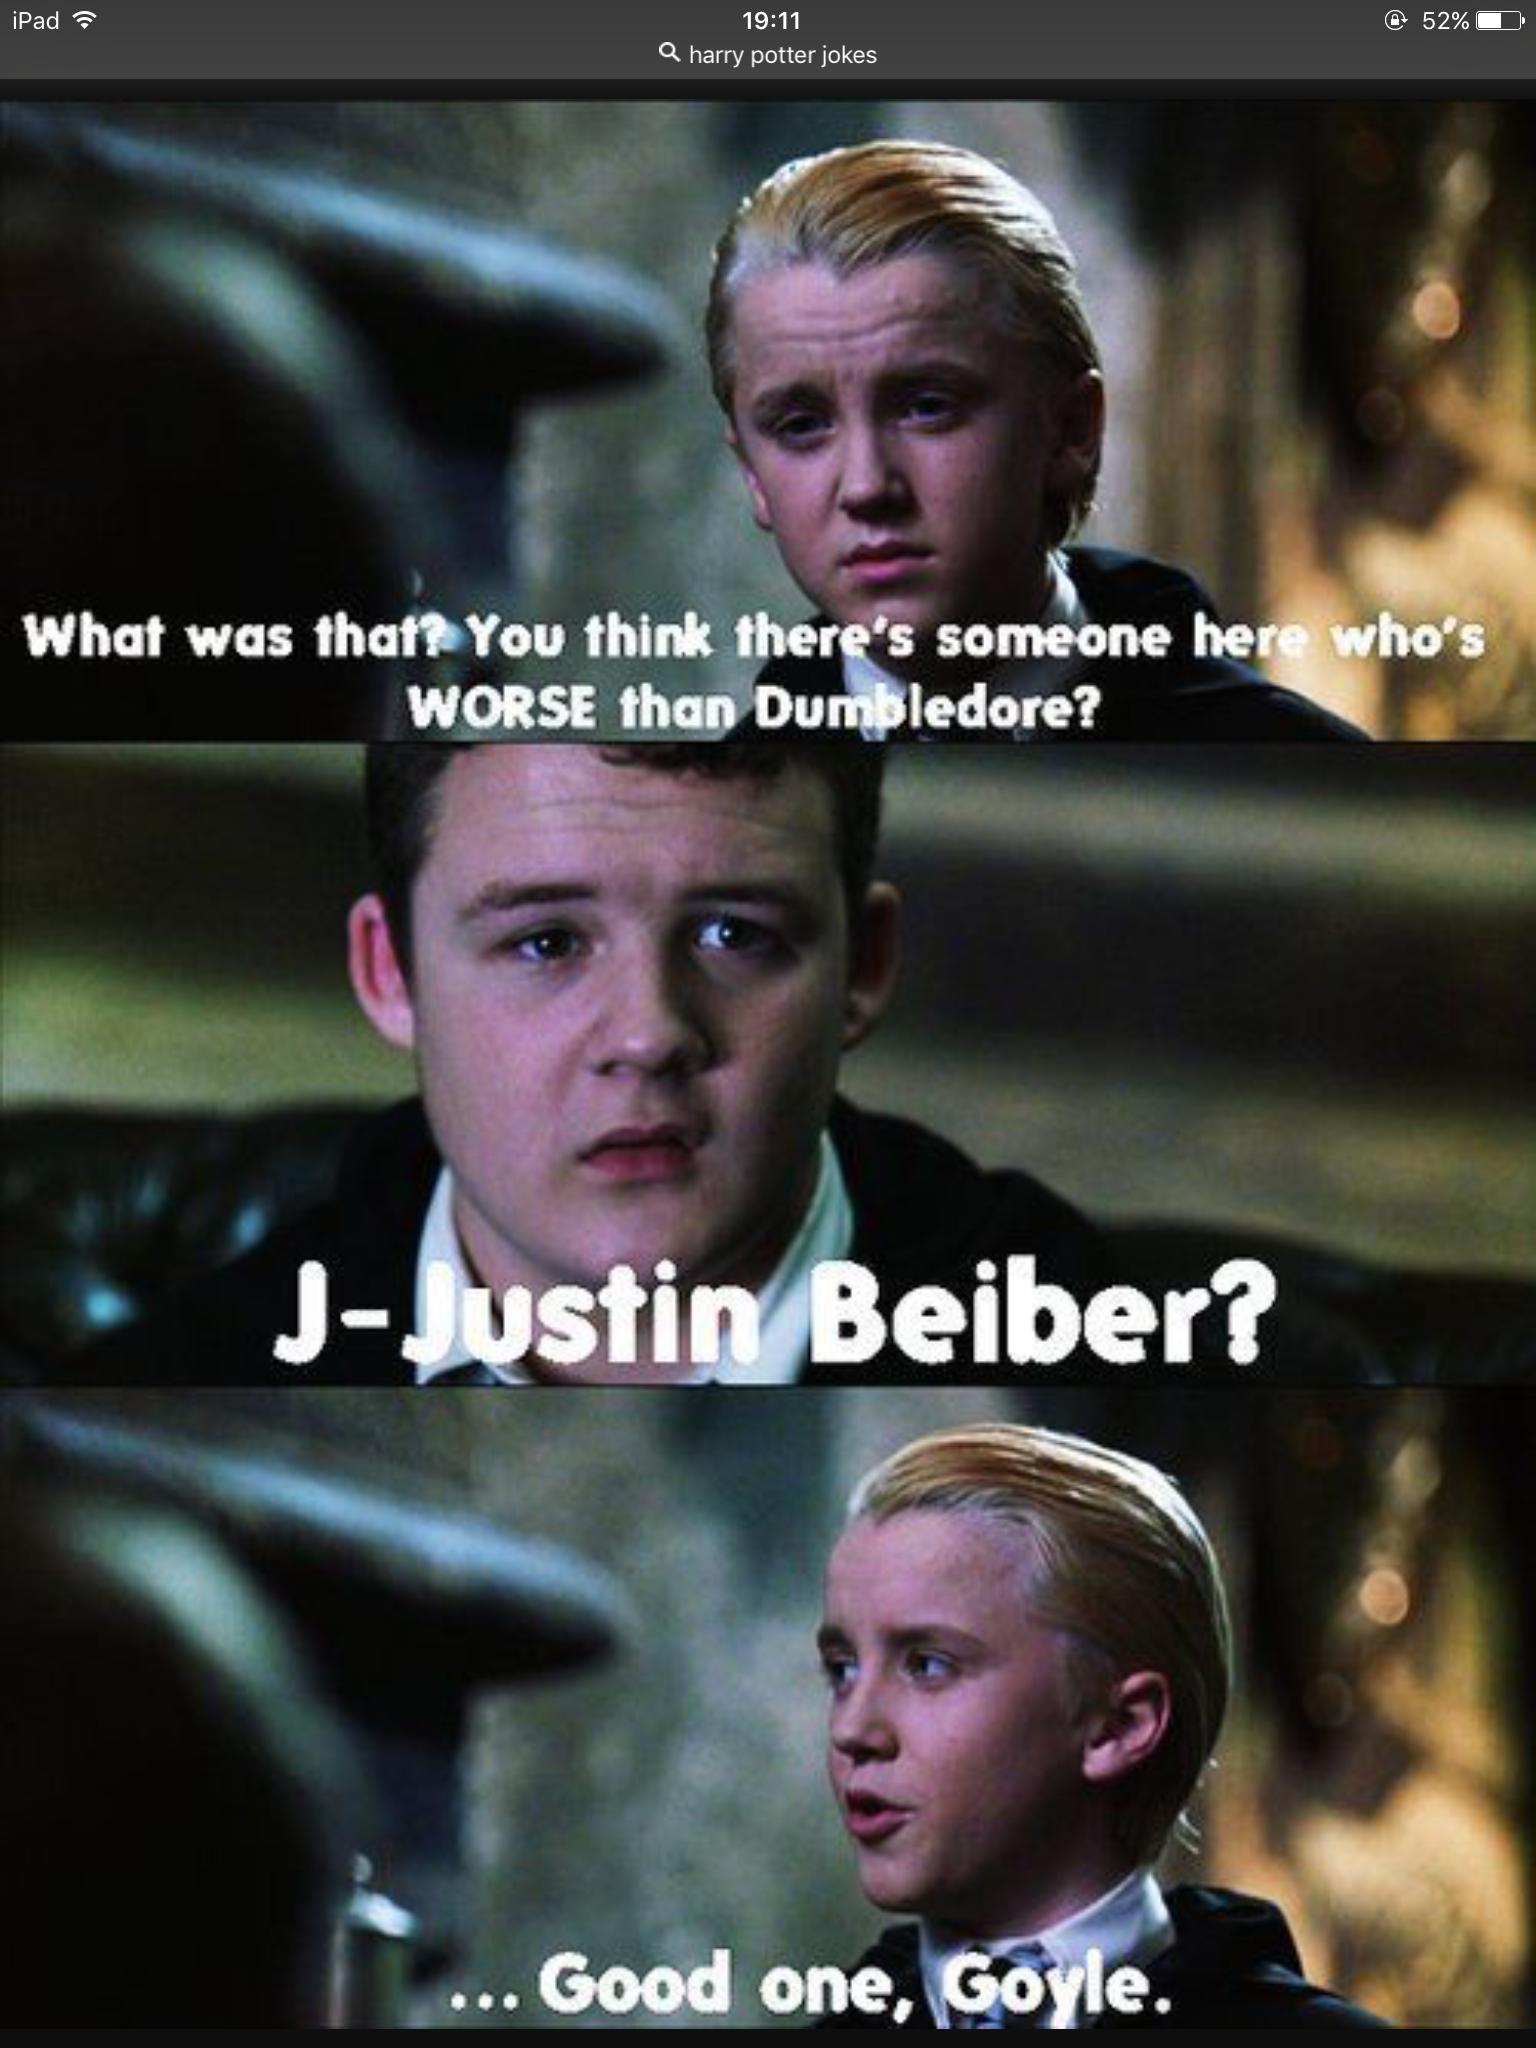 Top 22 Harry Potter Memes So True Harry Potter Quotes Funny Harry Potter Jokes Harry Potter Memes Hilarious